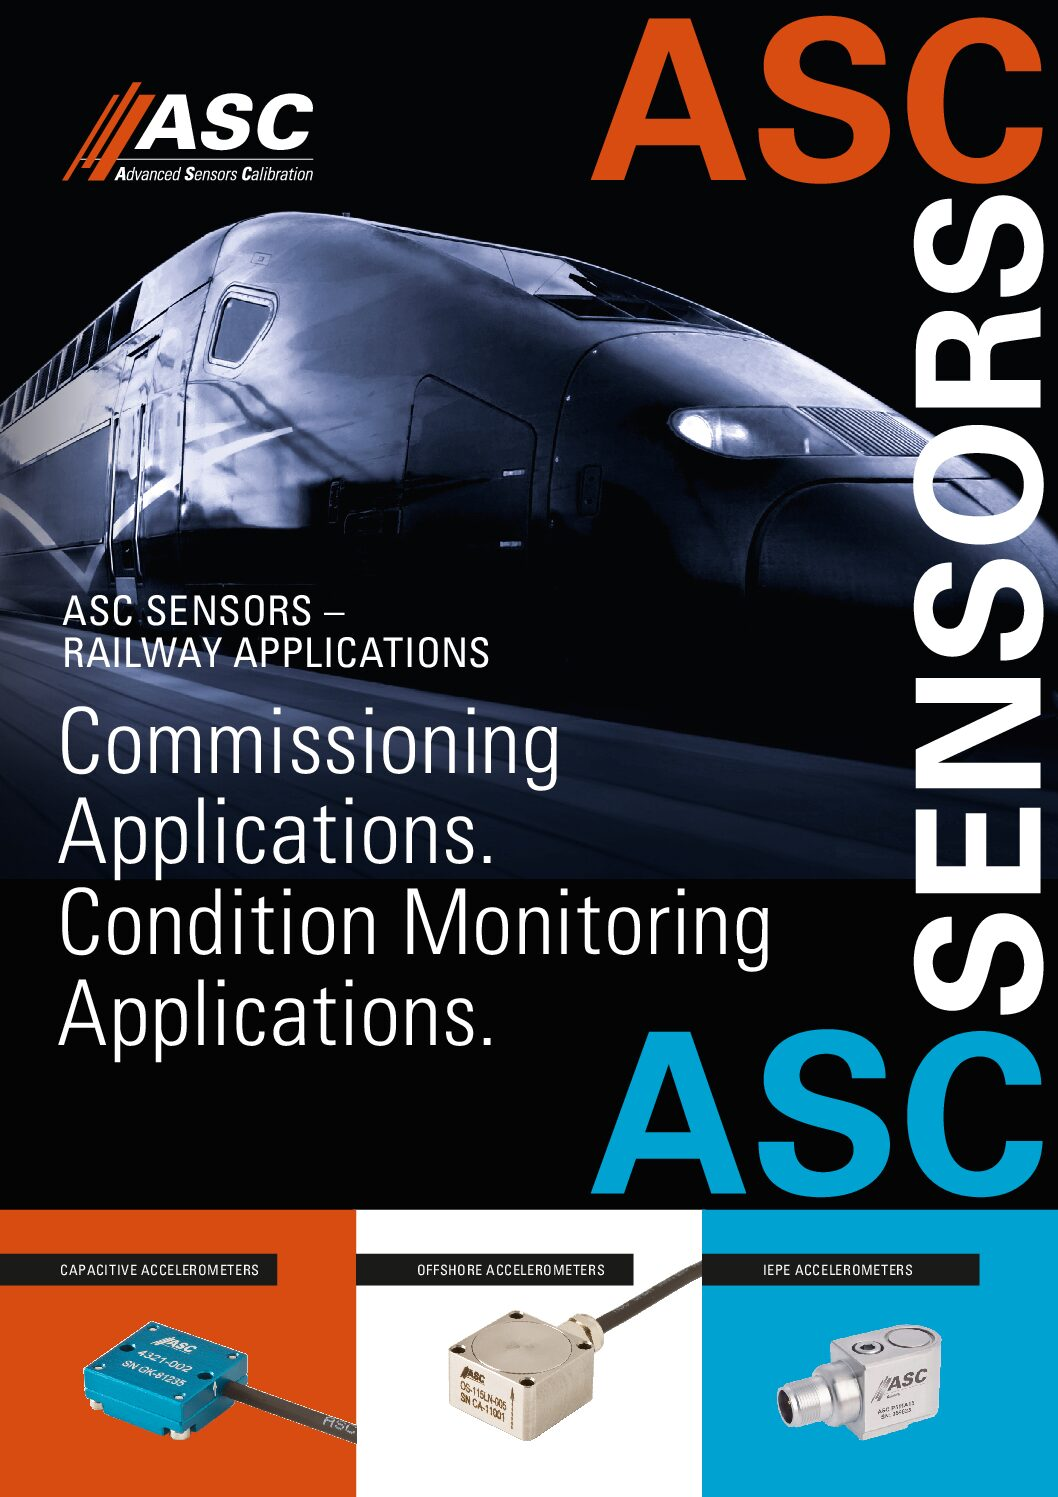 ASC Sensors for Railway Applications